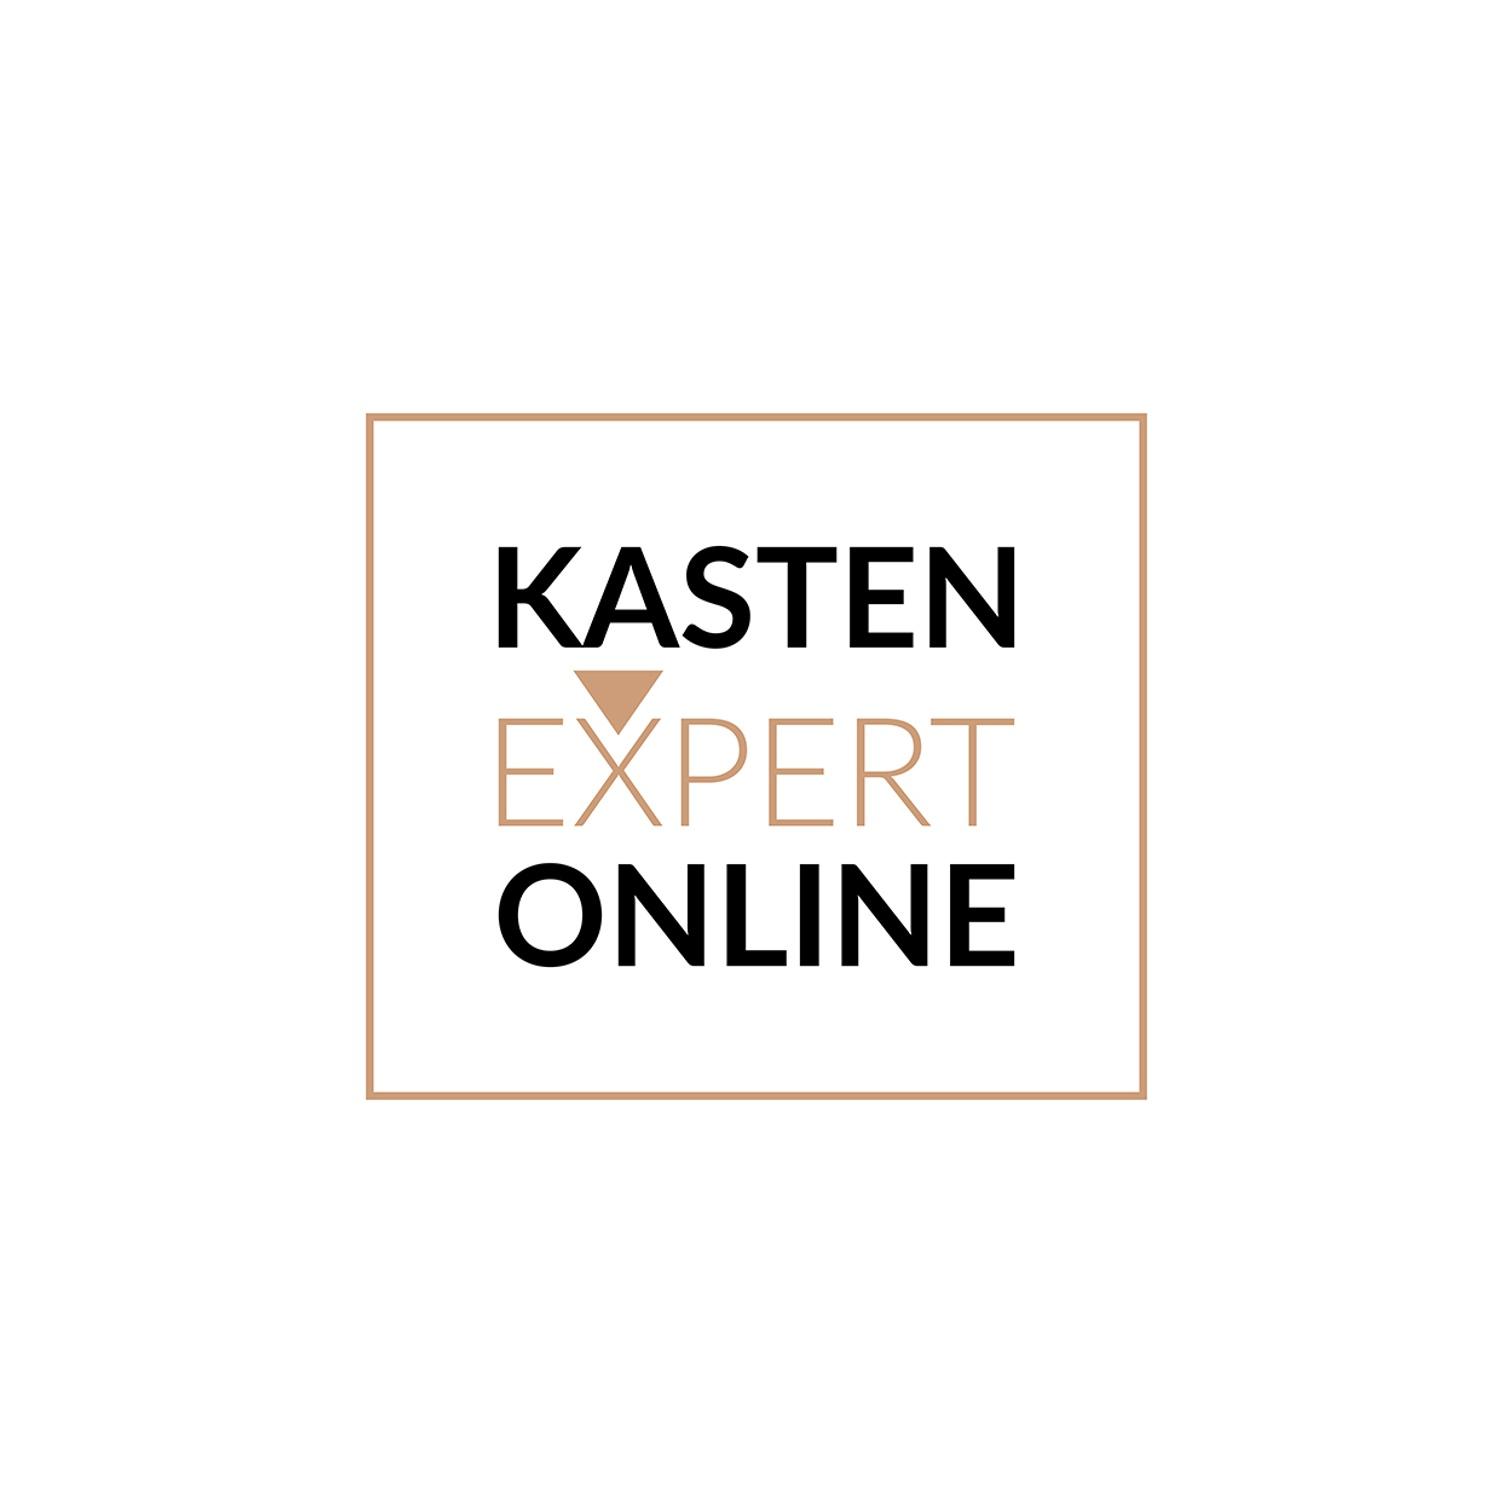 KastenexpertOnline logo